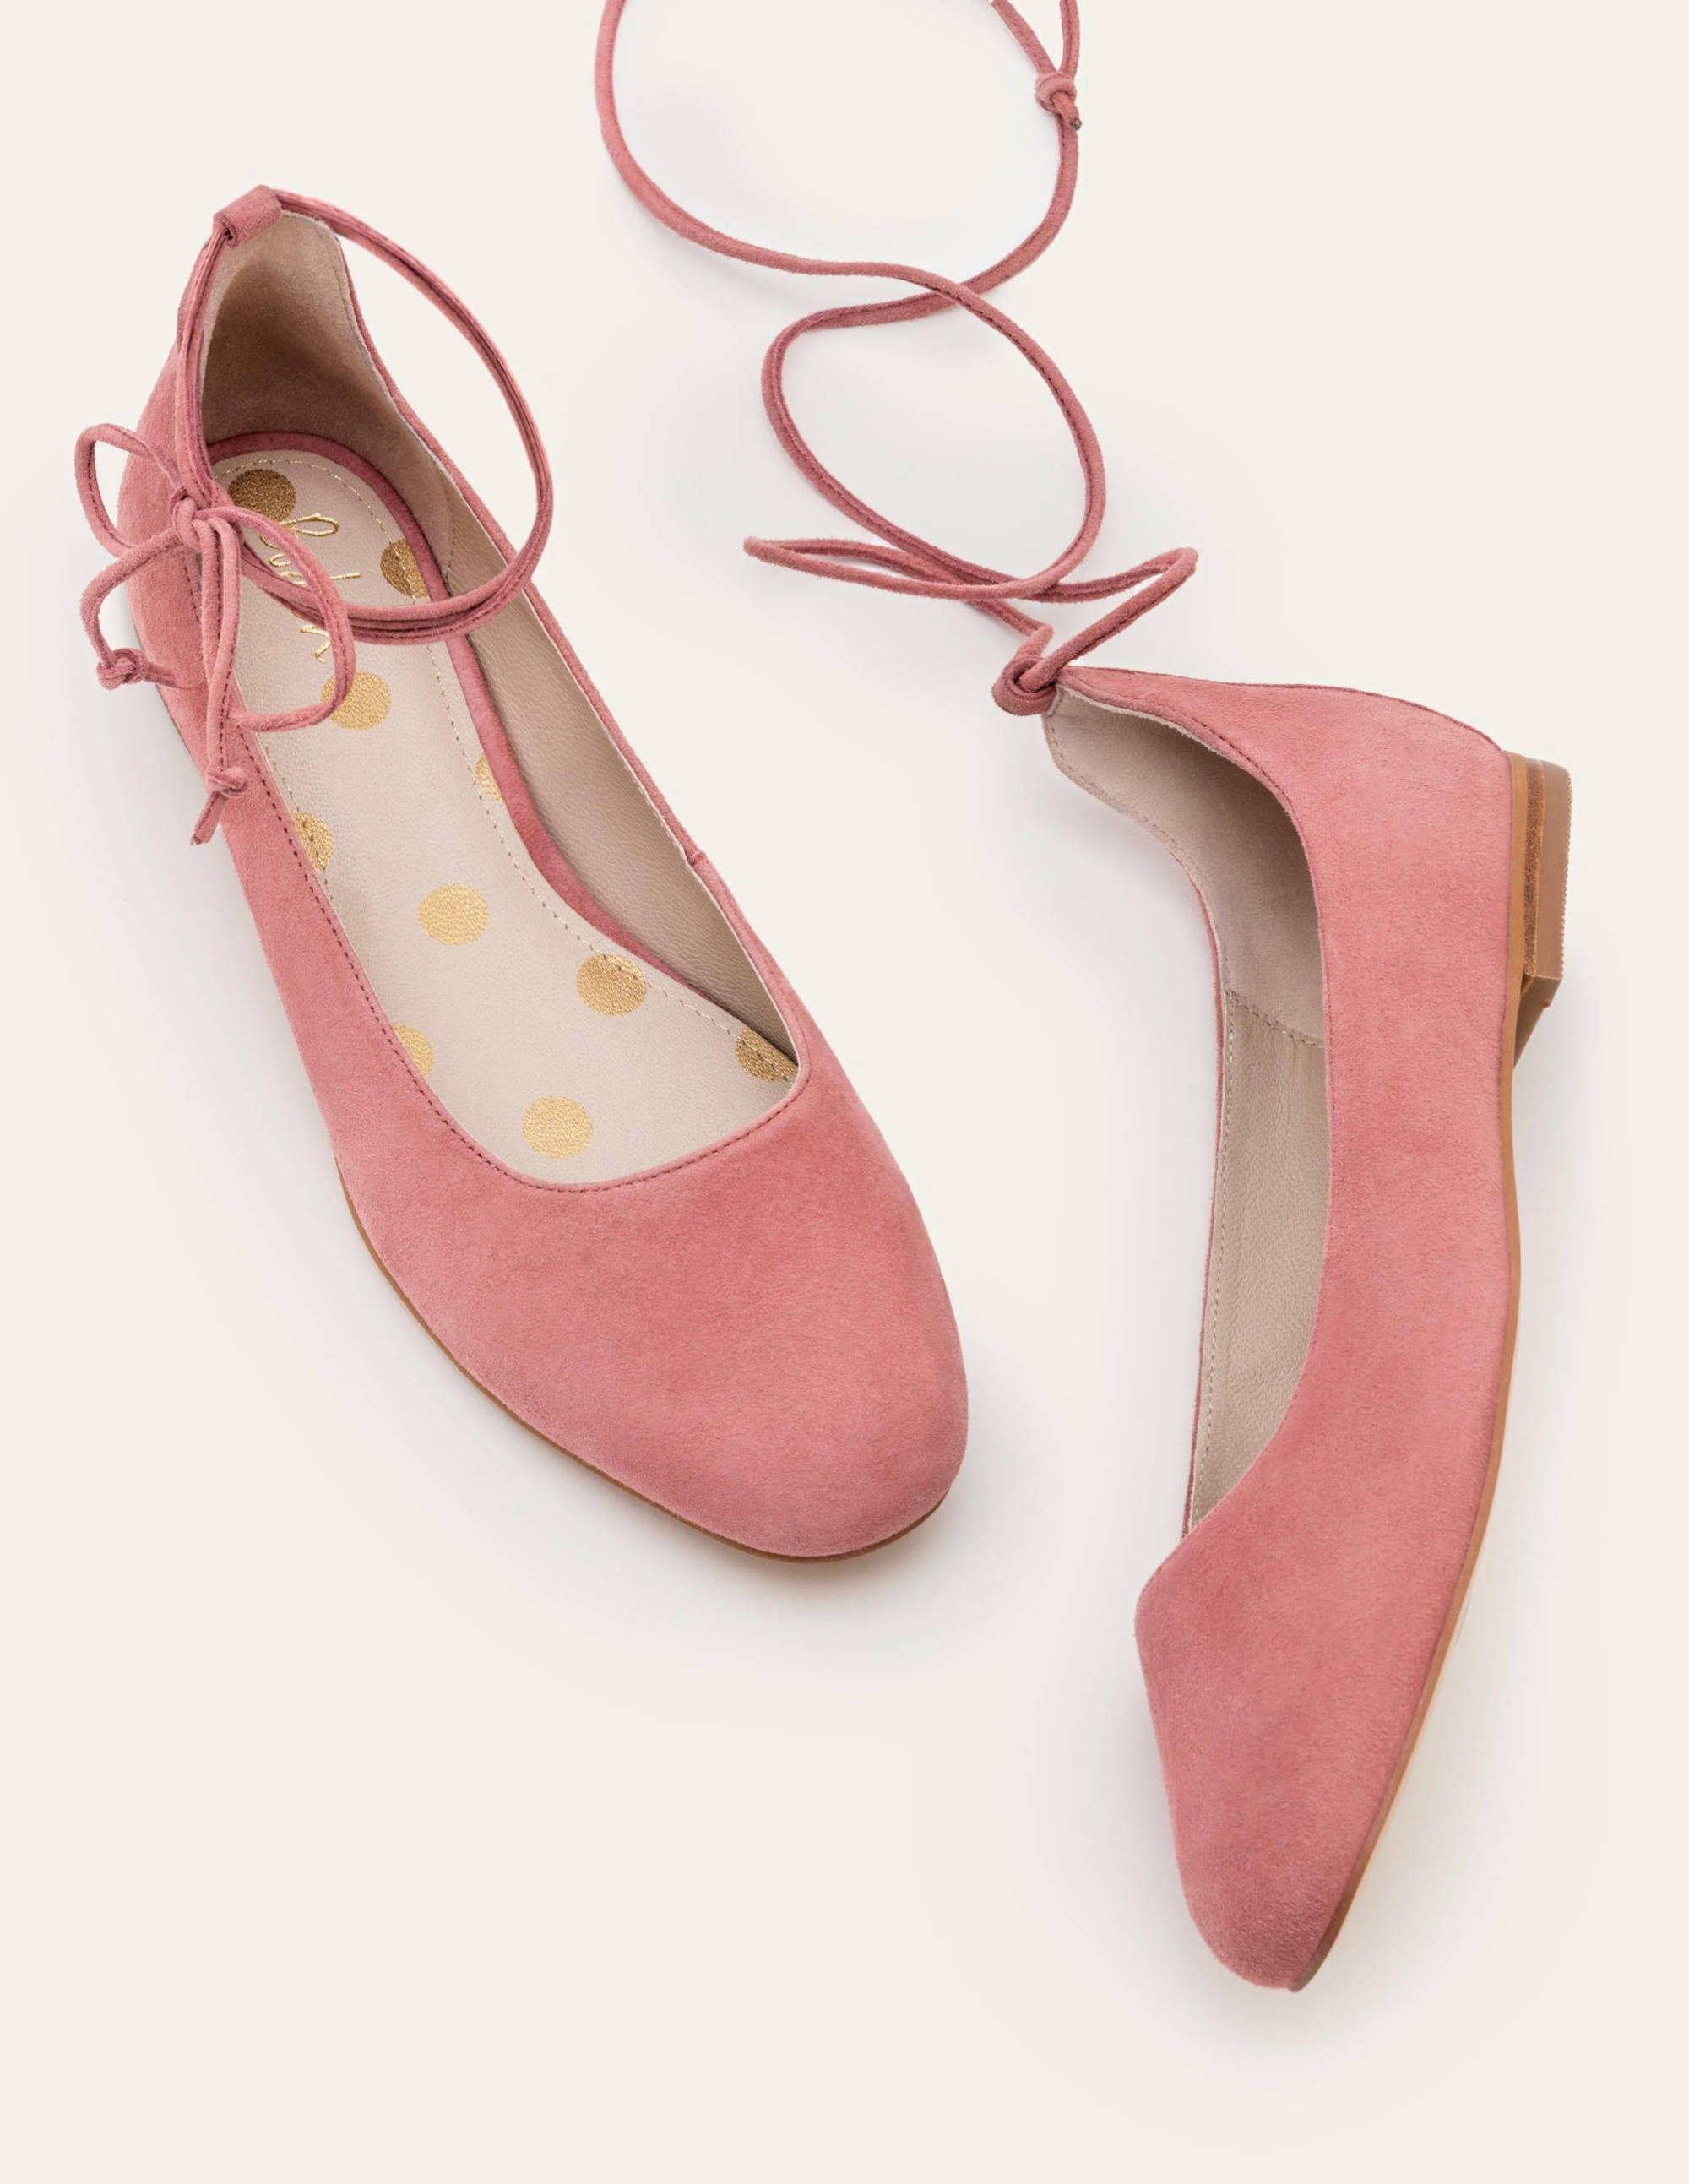 Effie Ballet Flats - Dusty Rose | Boden US